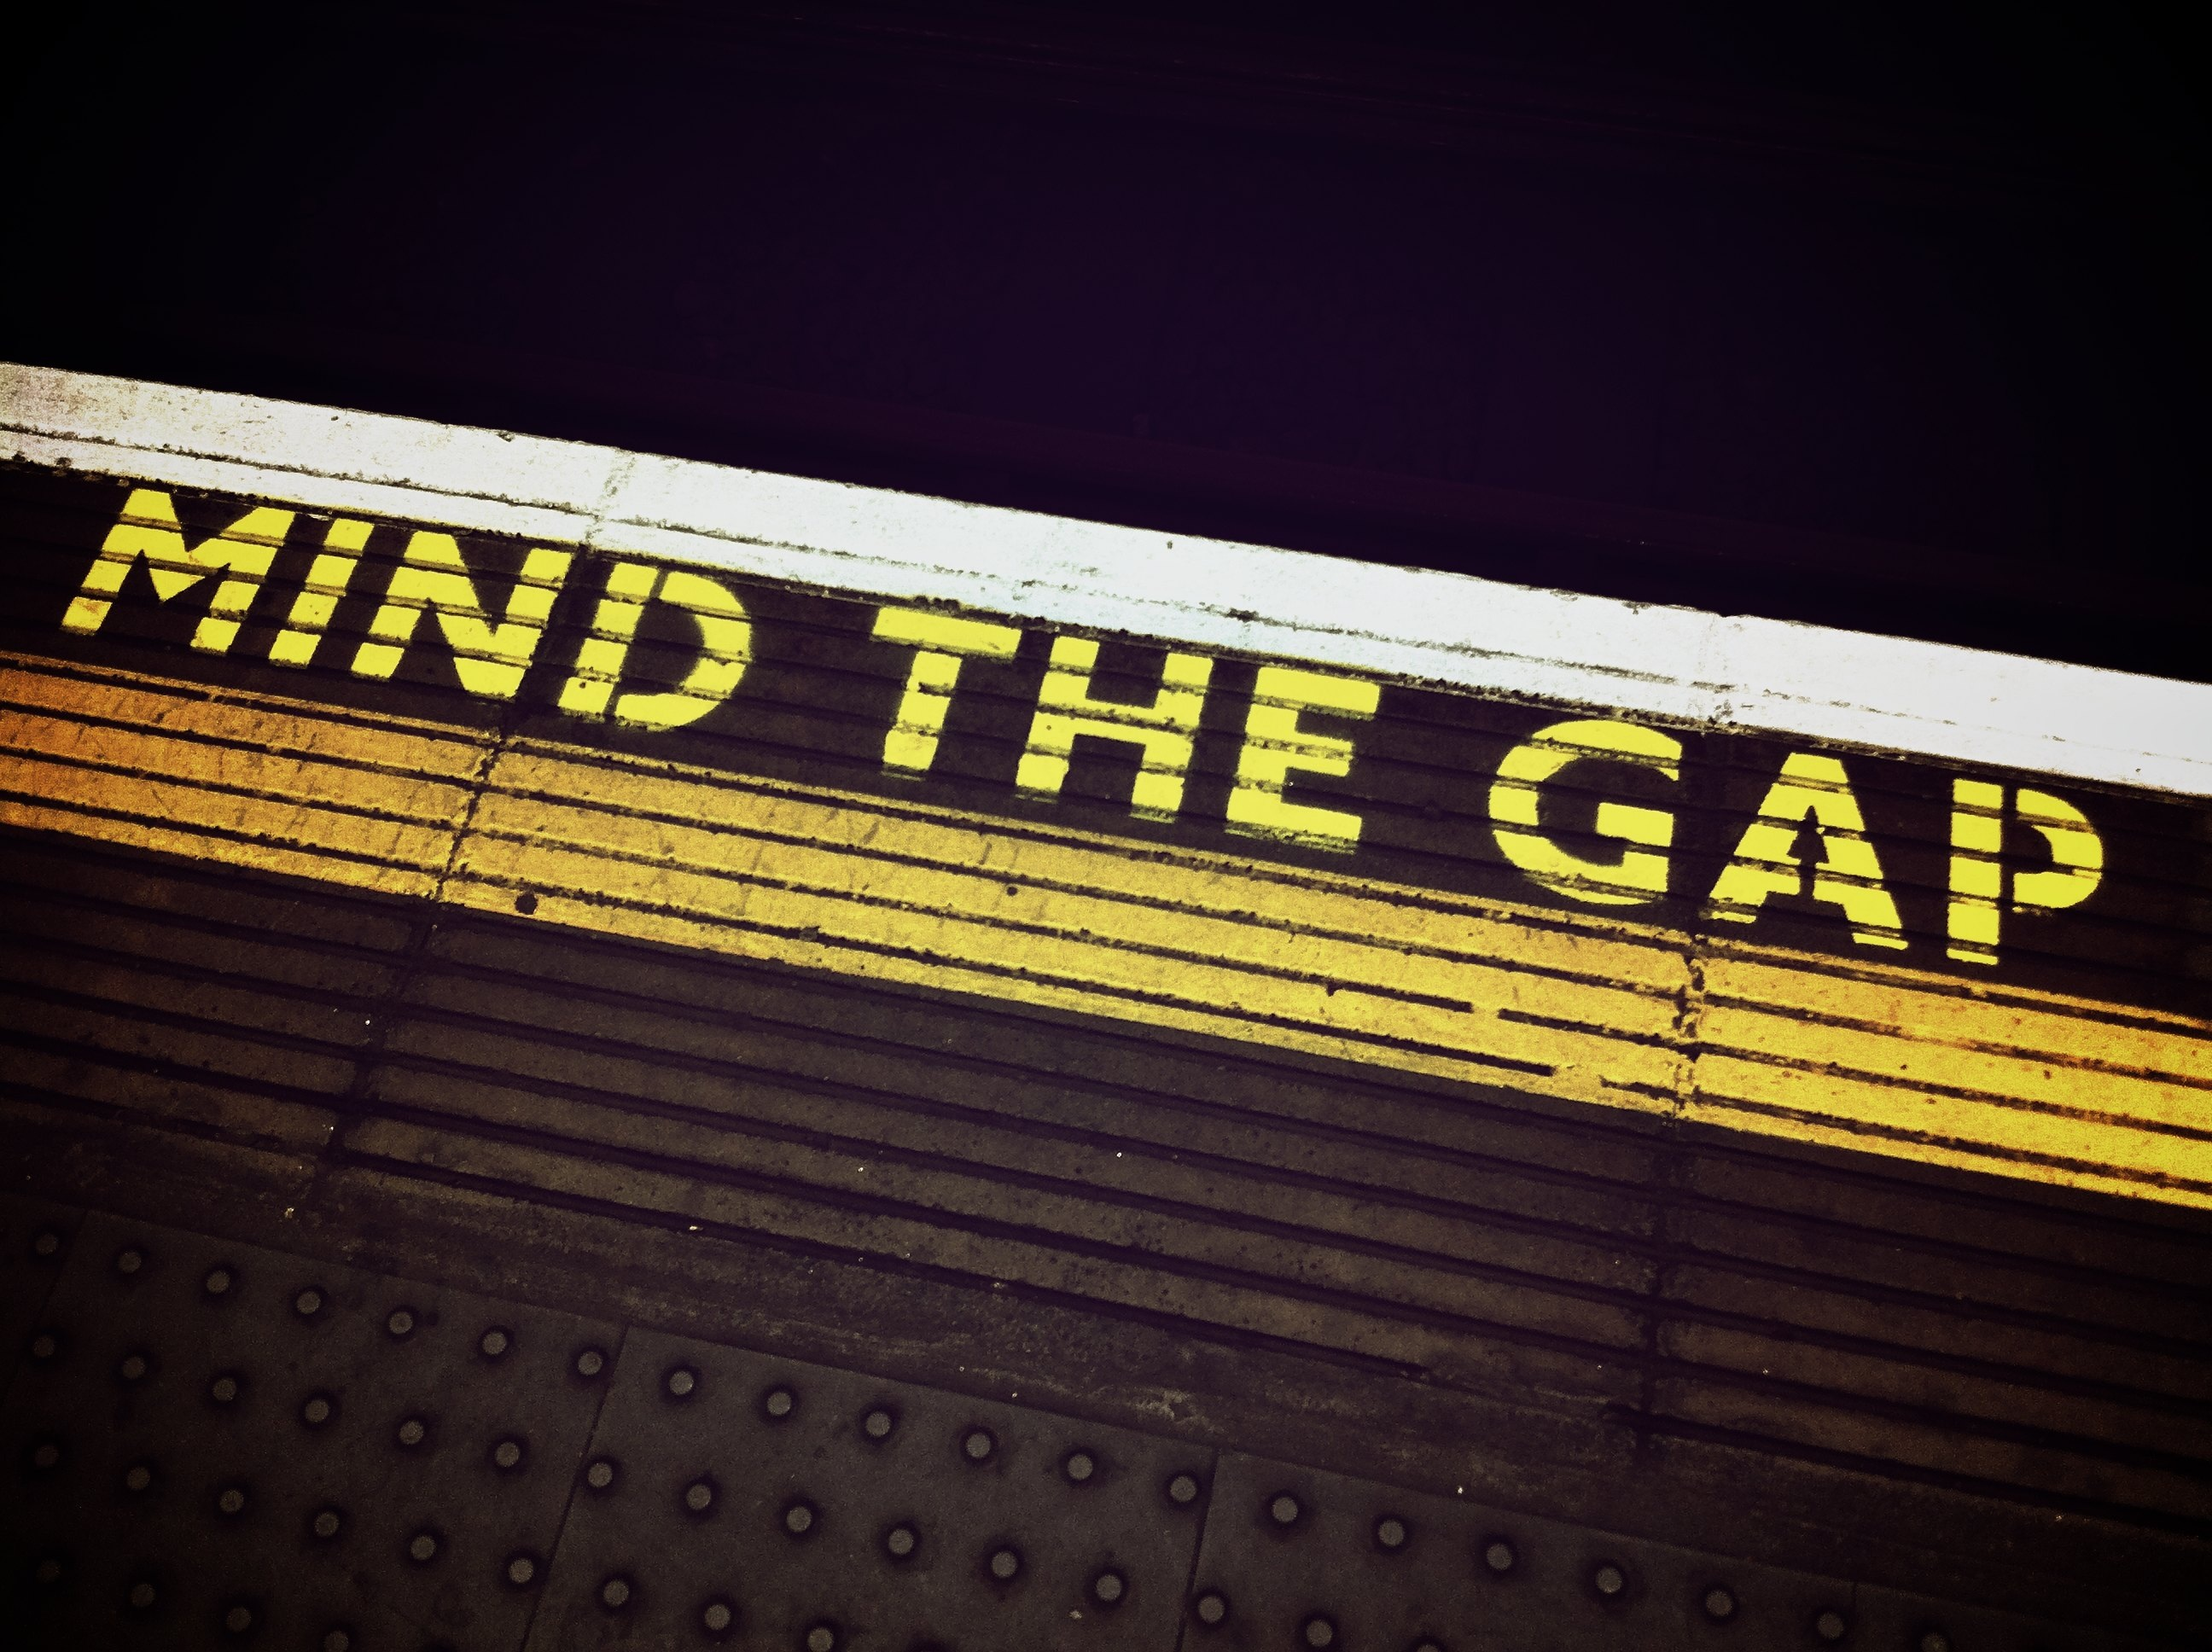 mind-the-gap-1876790